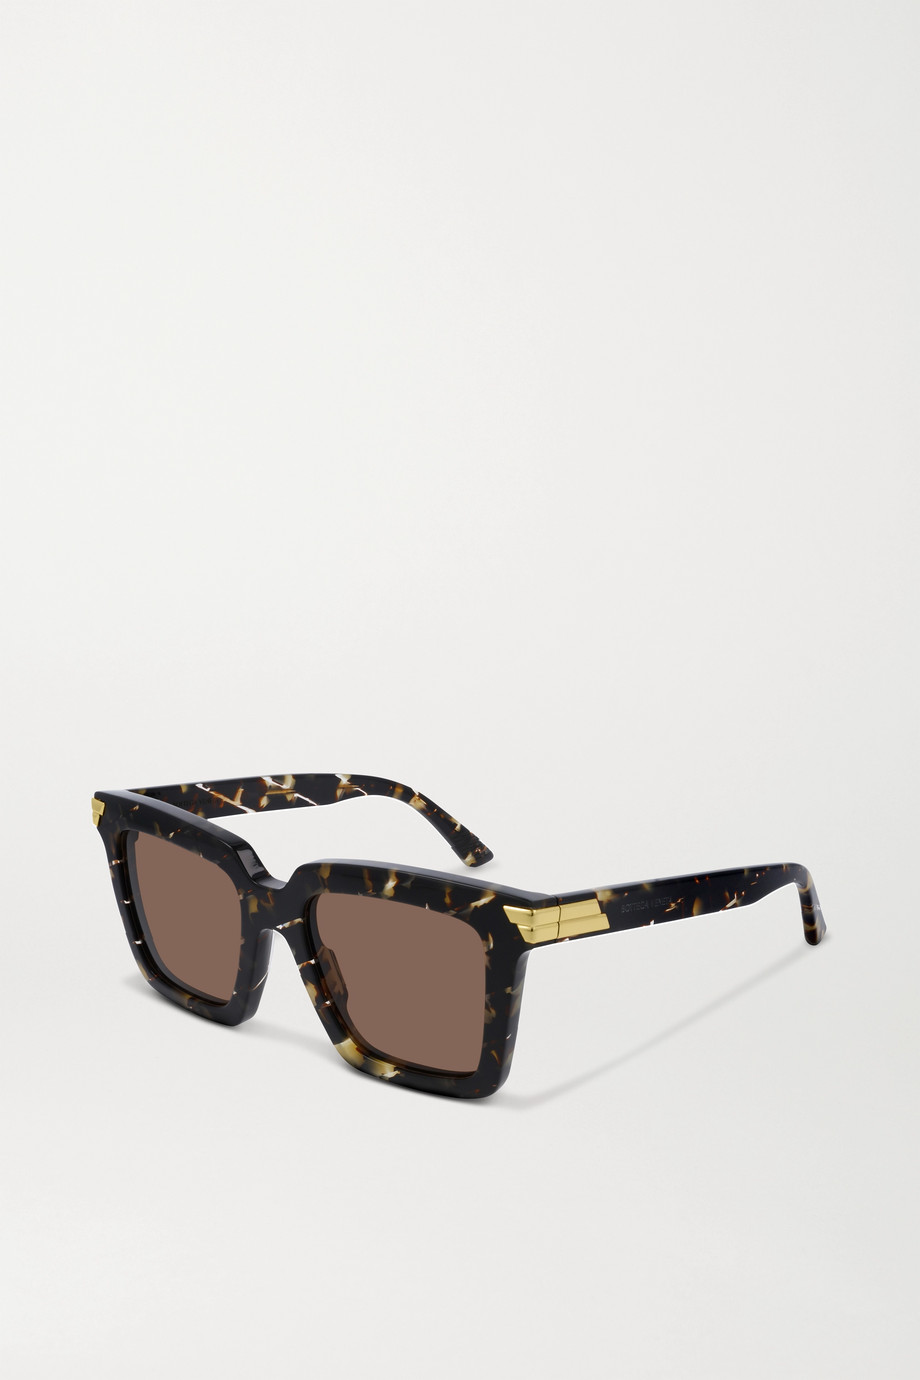 Bottega Veneta 超大款板材方框太阳镜